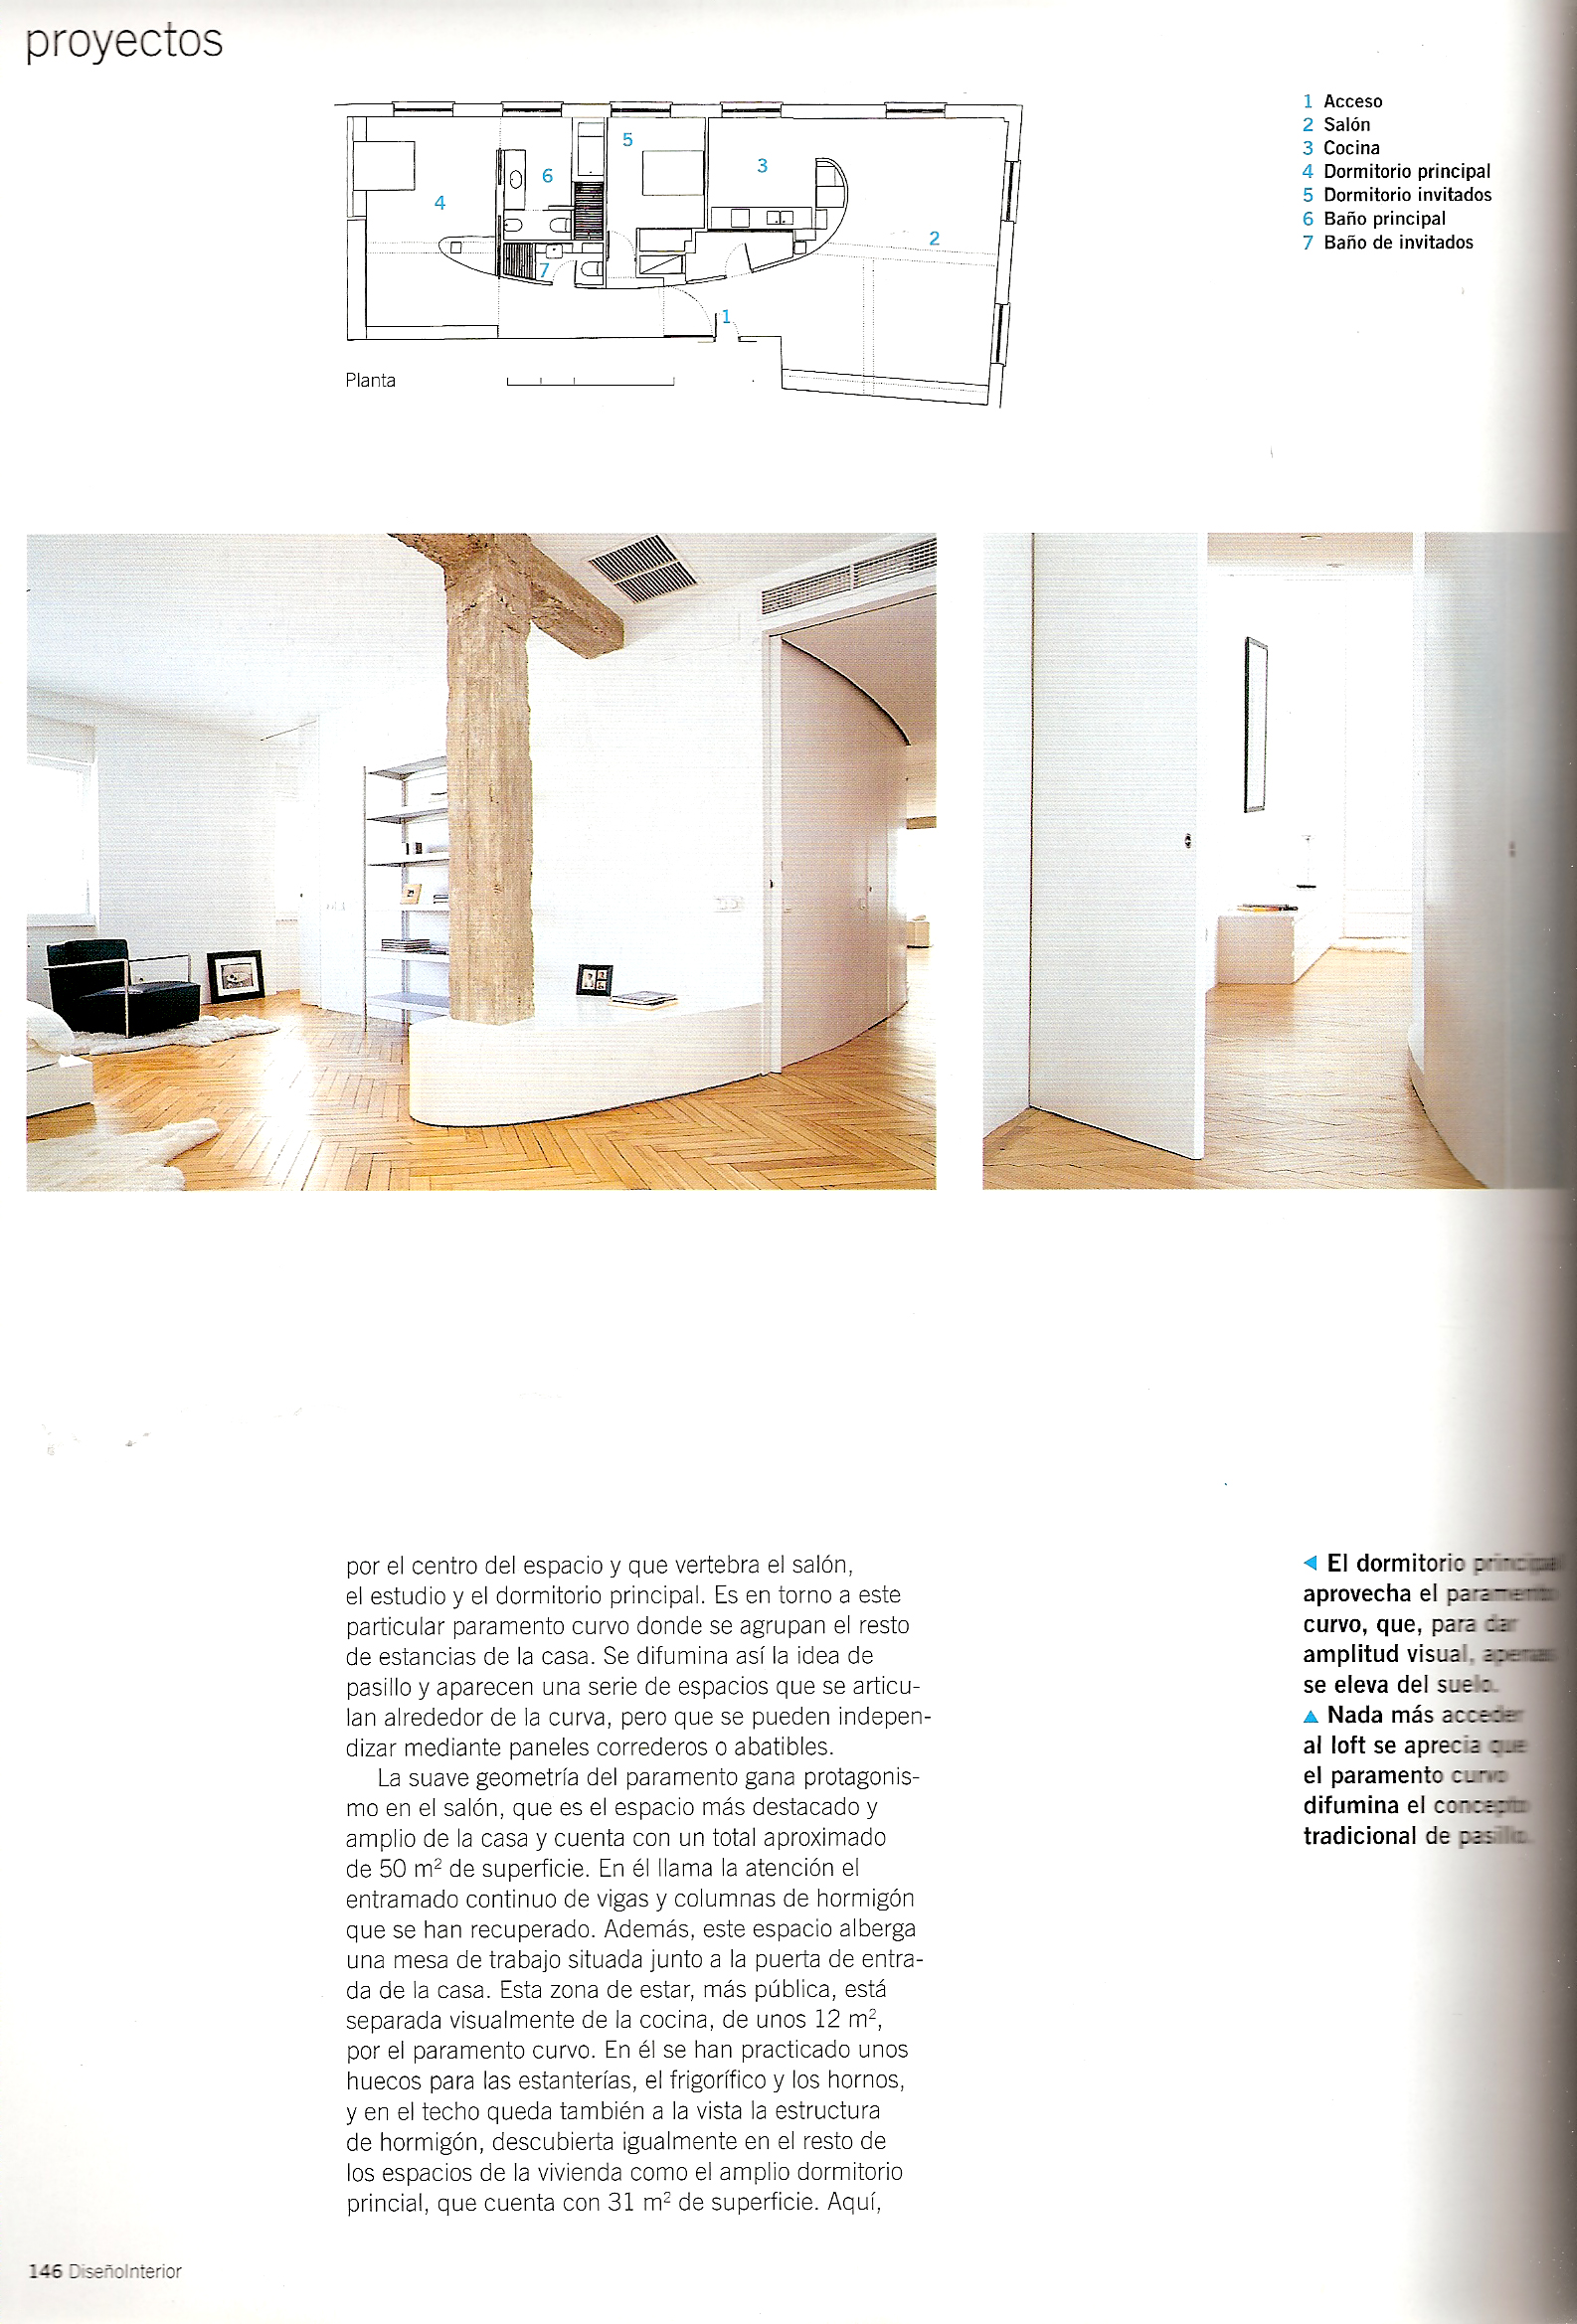 septiembre-2003-pagina-5